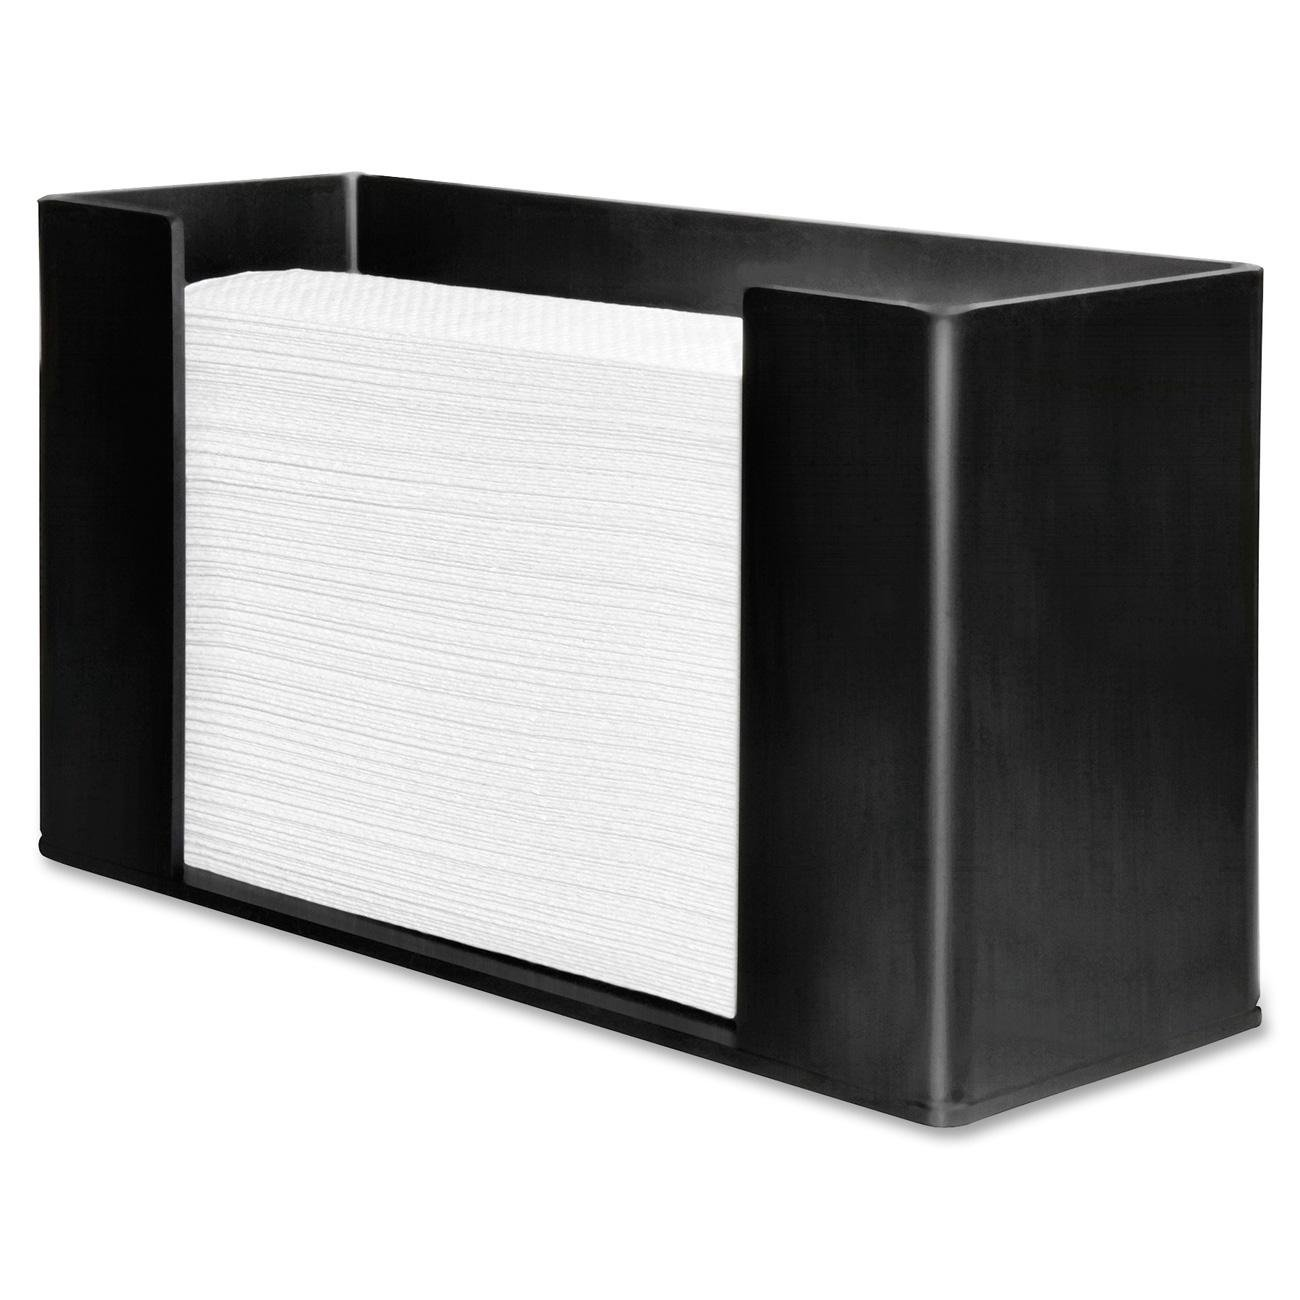 Genuine Joe GJO11524 Acrylic C Fold/Multifold Paper Towel Dispenser, 11-1/2'' Length x 4-3/32'' Width x 6-51/64'' Height, Black (4 DISPENSERS) by Genuine Joe (Image #1)